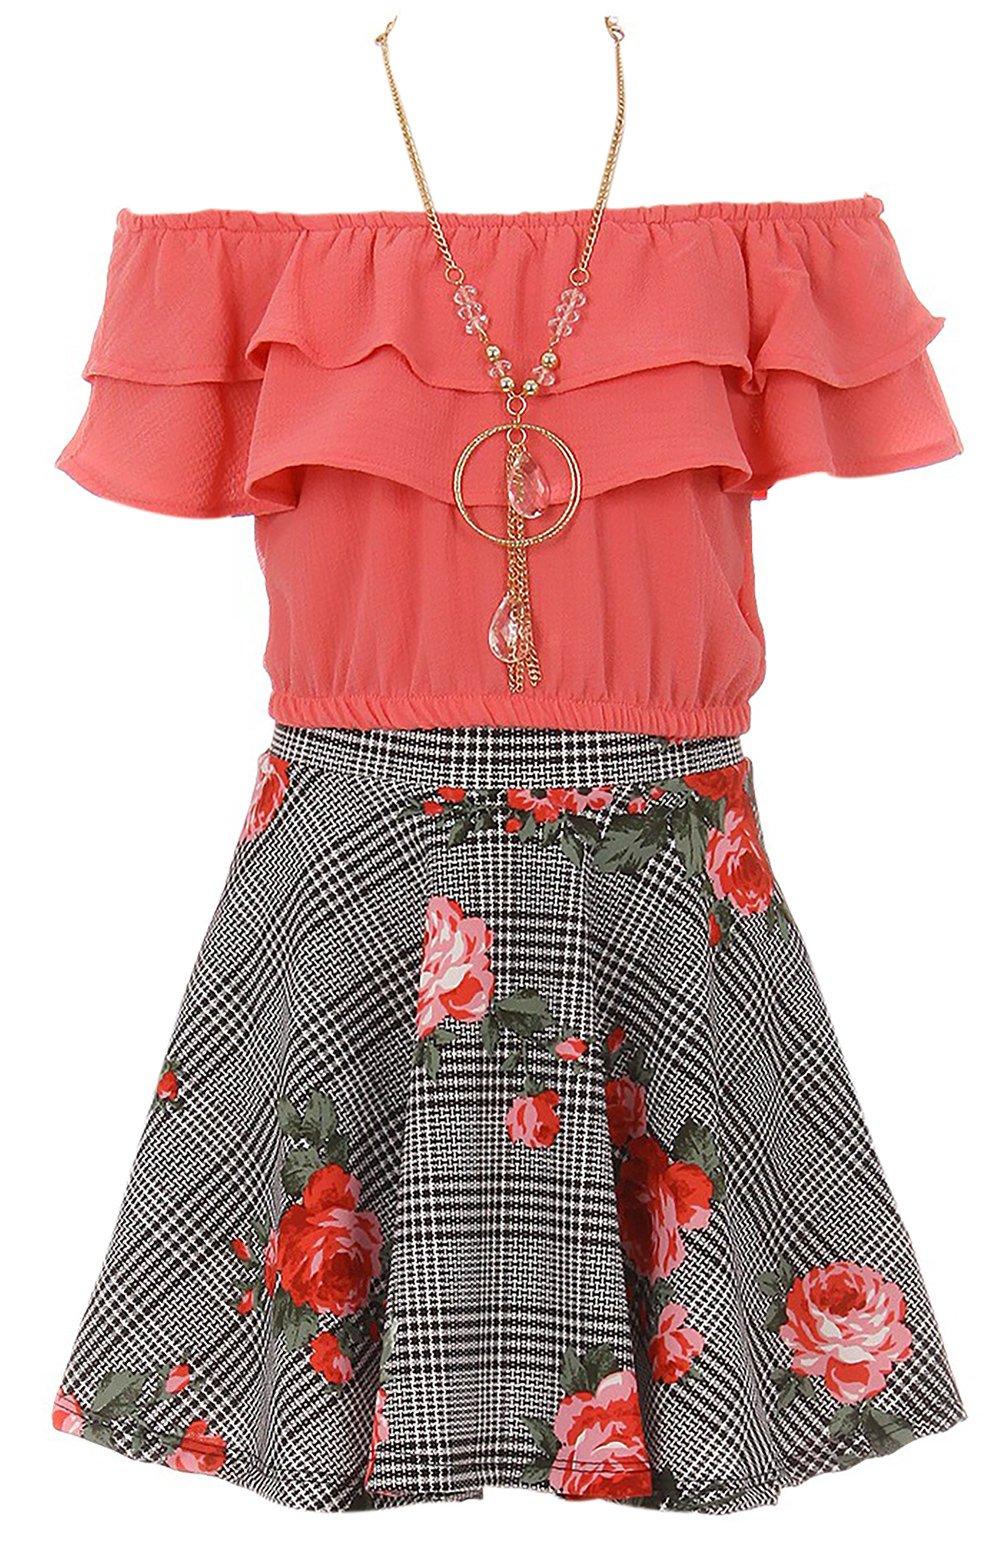 Little Girls Off Shoulder Tops Skirt Necklace 3 Pieces Party Summer Clothing Set Coral 6 (J21KS30S)